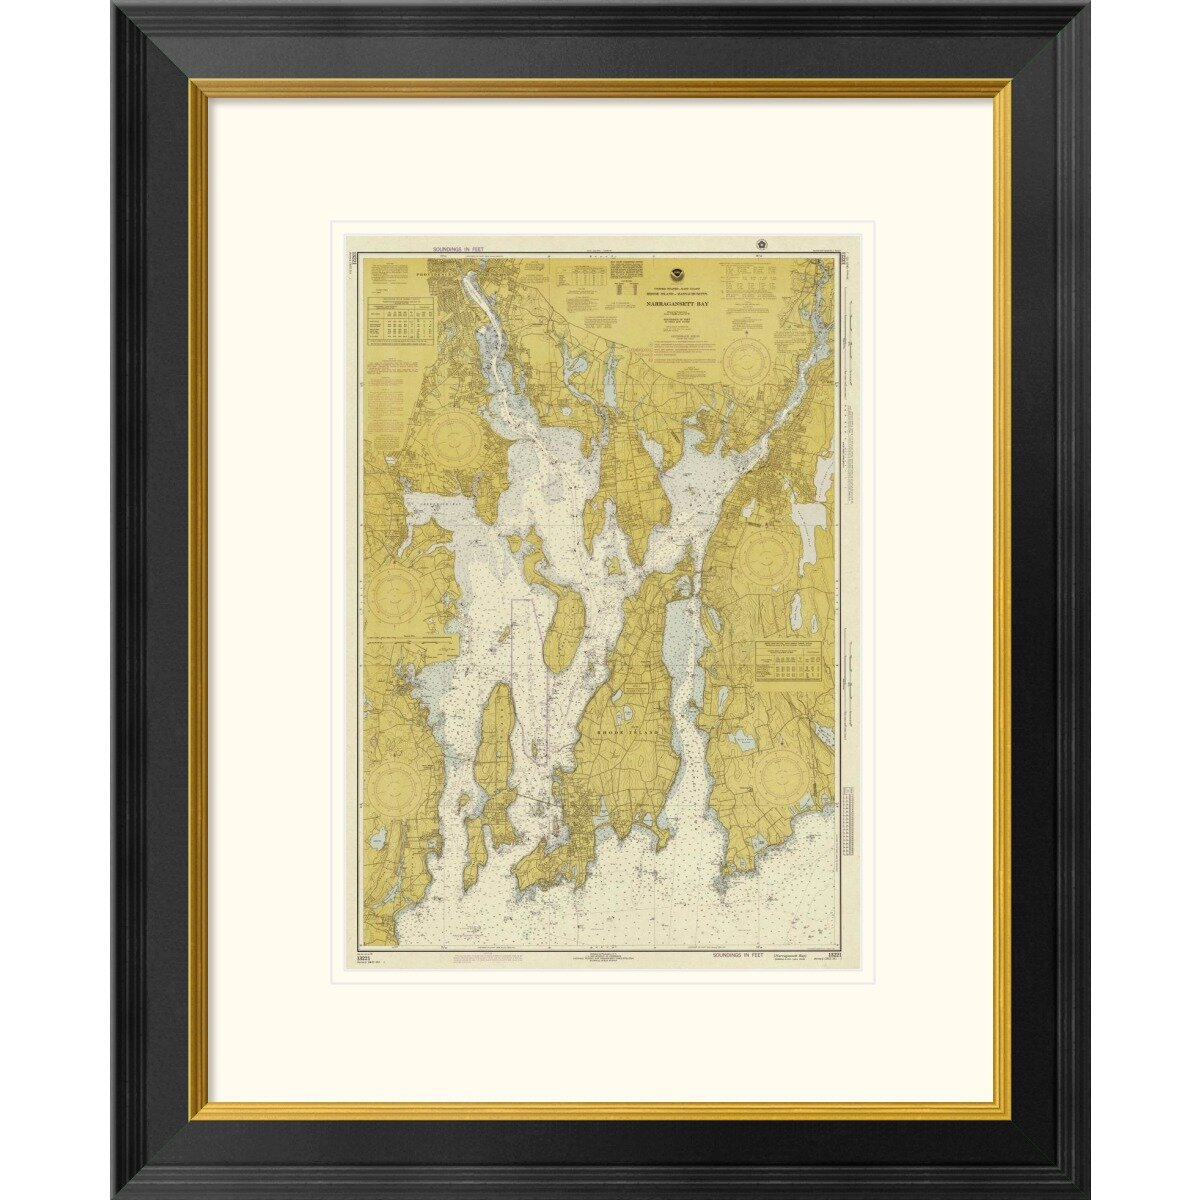 Global Gallery Nautical Chart Narragansett Bay Ca 1975 Sepia Tinted Framed Graphic Art Wayfair